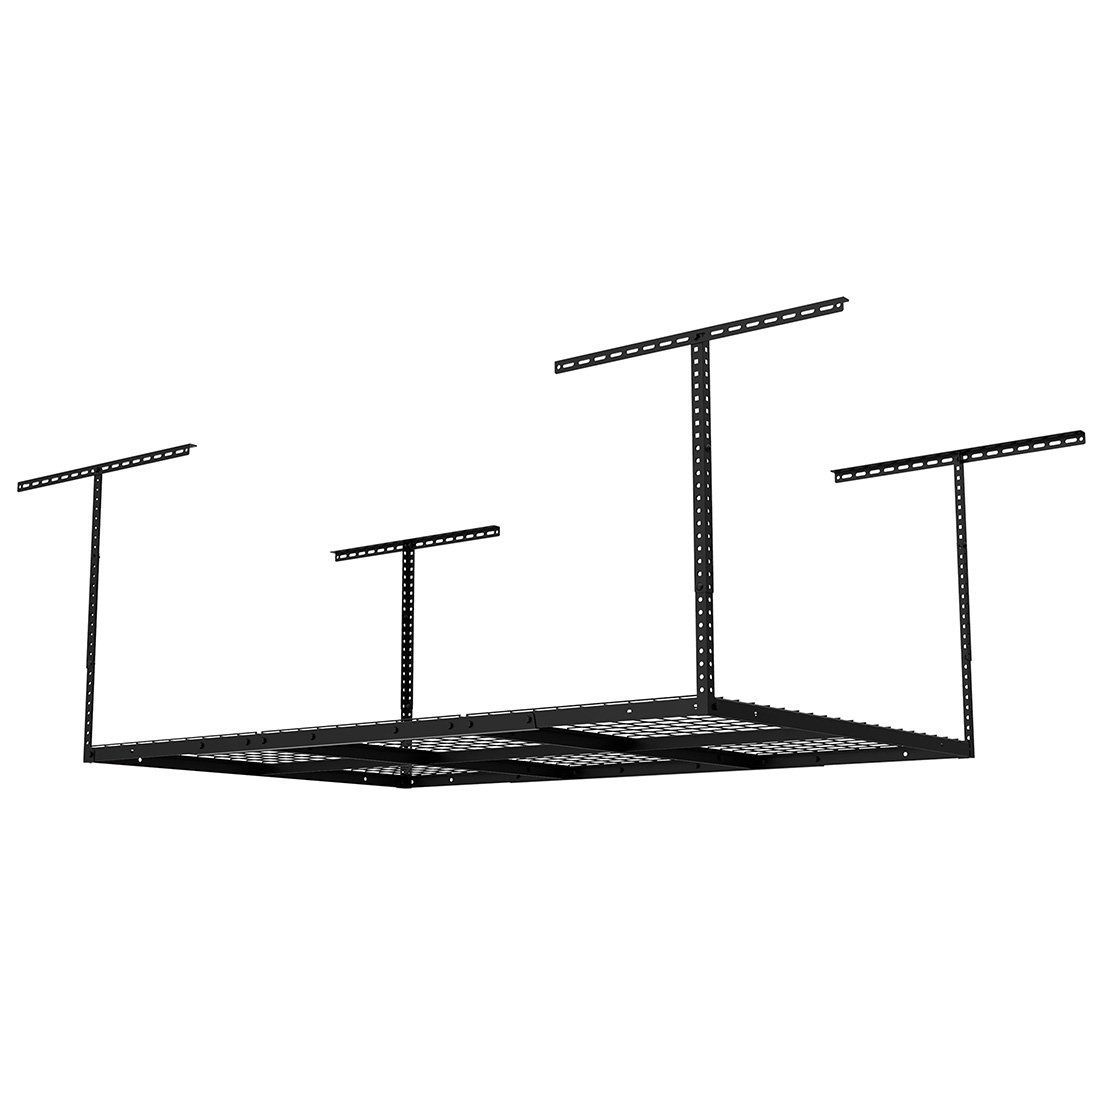 "FLEXIMOUNTS 4x6 Heavy Duty Overhead Garage Adjustable Ceiling Storage Rack, 72"" Length x 48"" Width x 40"" Height, Black"